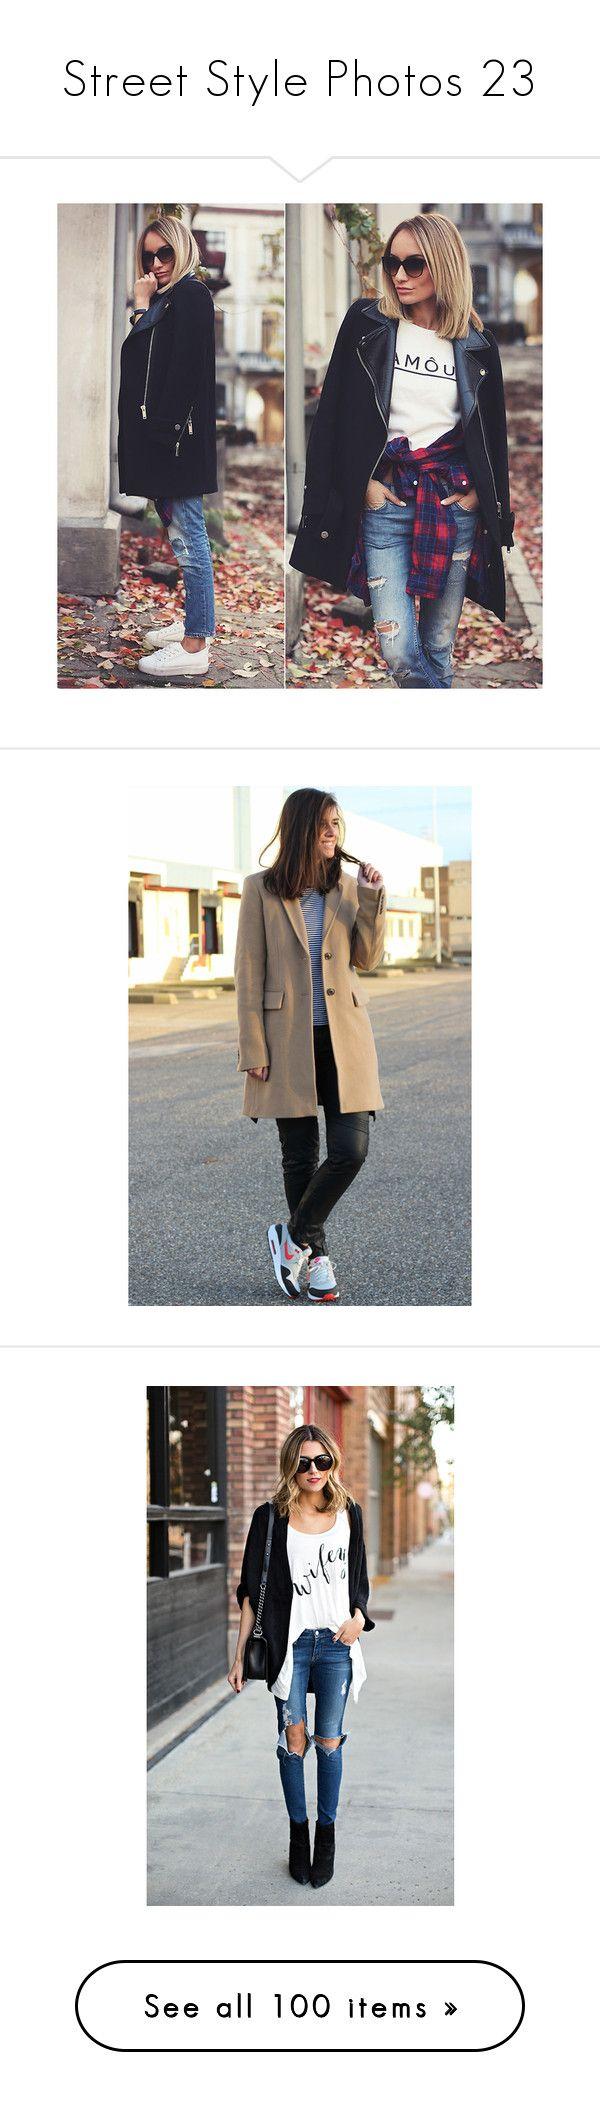 """Street Style Photos 23"" by chocolatepumma ❤ liked on Polyvore featuring pictures, outerwear, coats, nike coat, nike, brown coat, camel coat, white shrug, shrug cardigan and cardigan shrug"